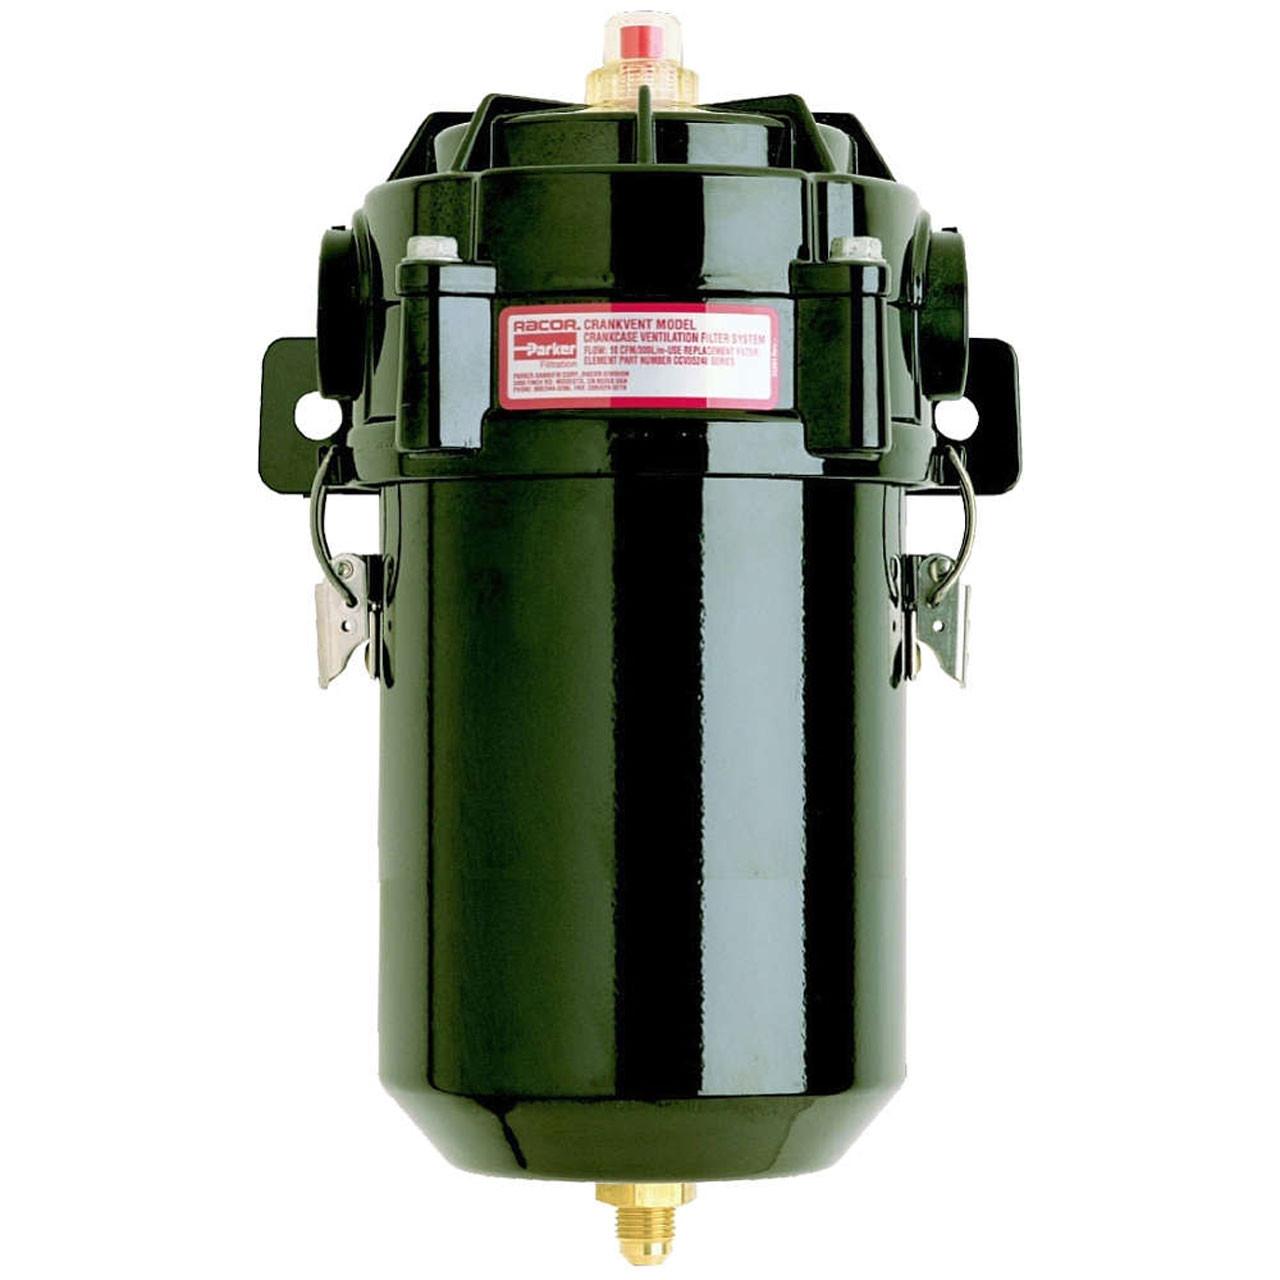 parker racor ccv12000 series 50 cfm closed crankcase ventilation bypass filter assembly [ 1280 x 1280 Pixel ]